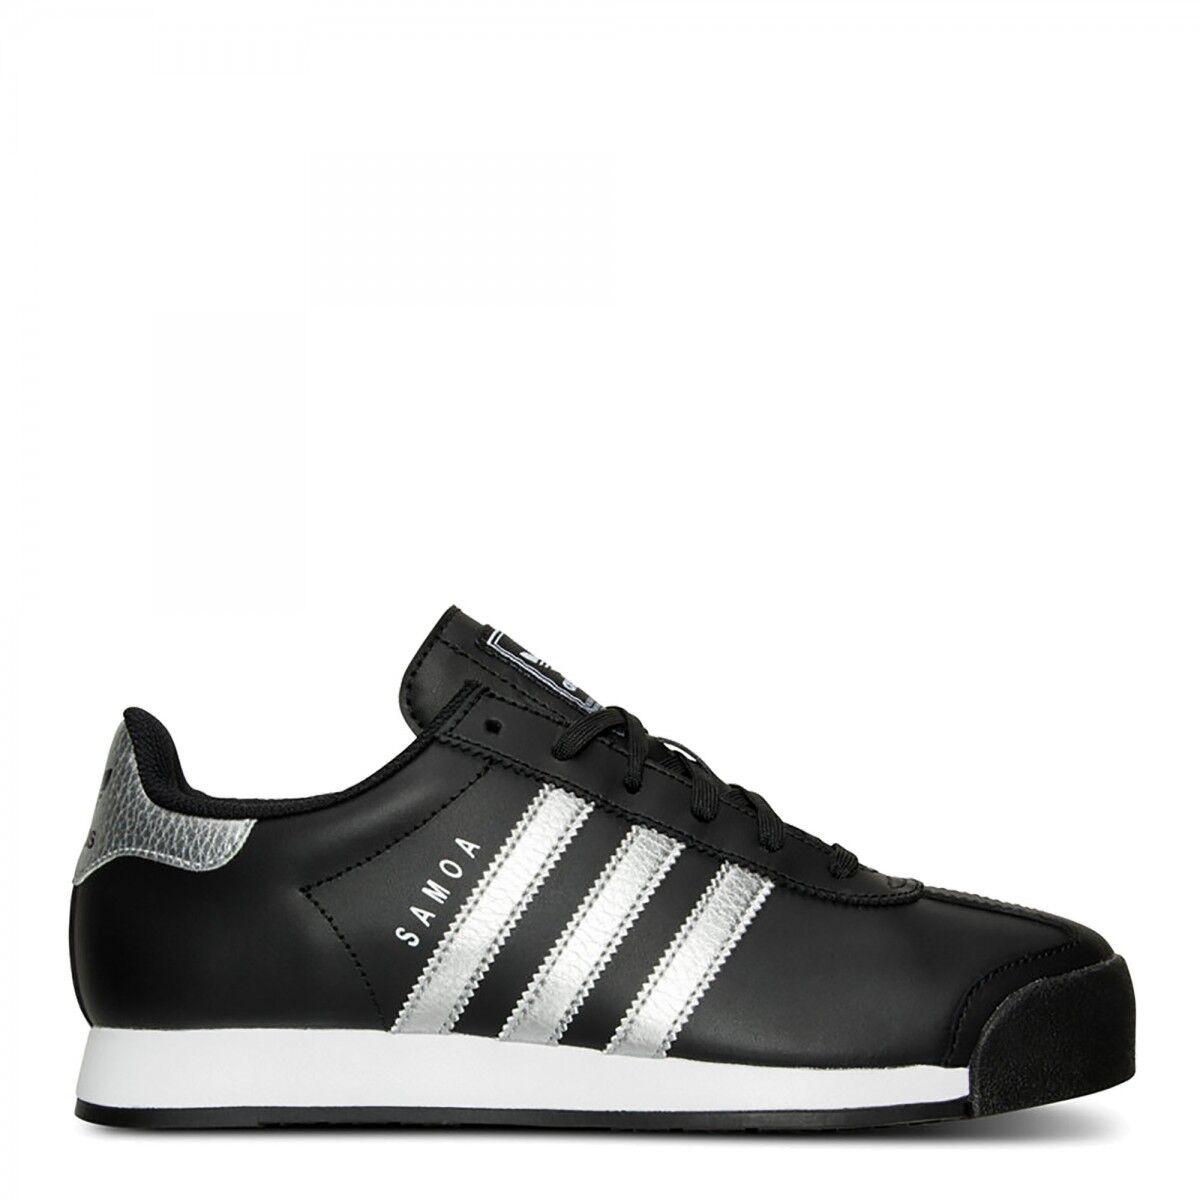 Adidas Originales Samoa redes Negro Plata Metallic Blanco zapatos Raiders redes Samoa Spurs 10 da3156